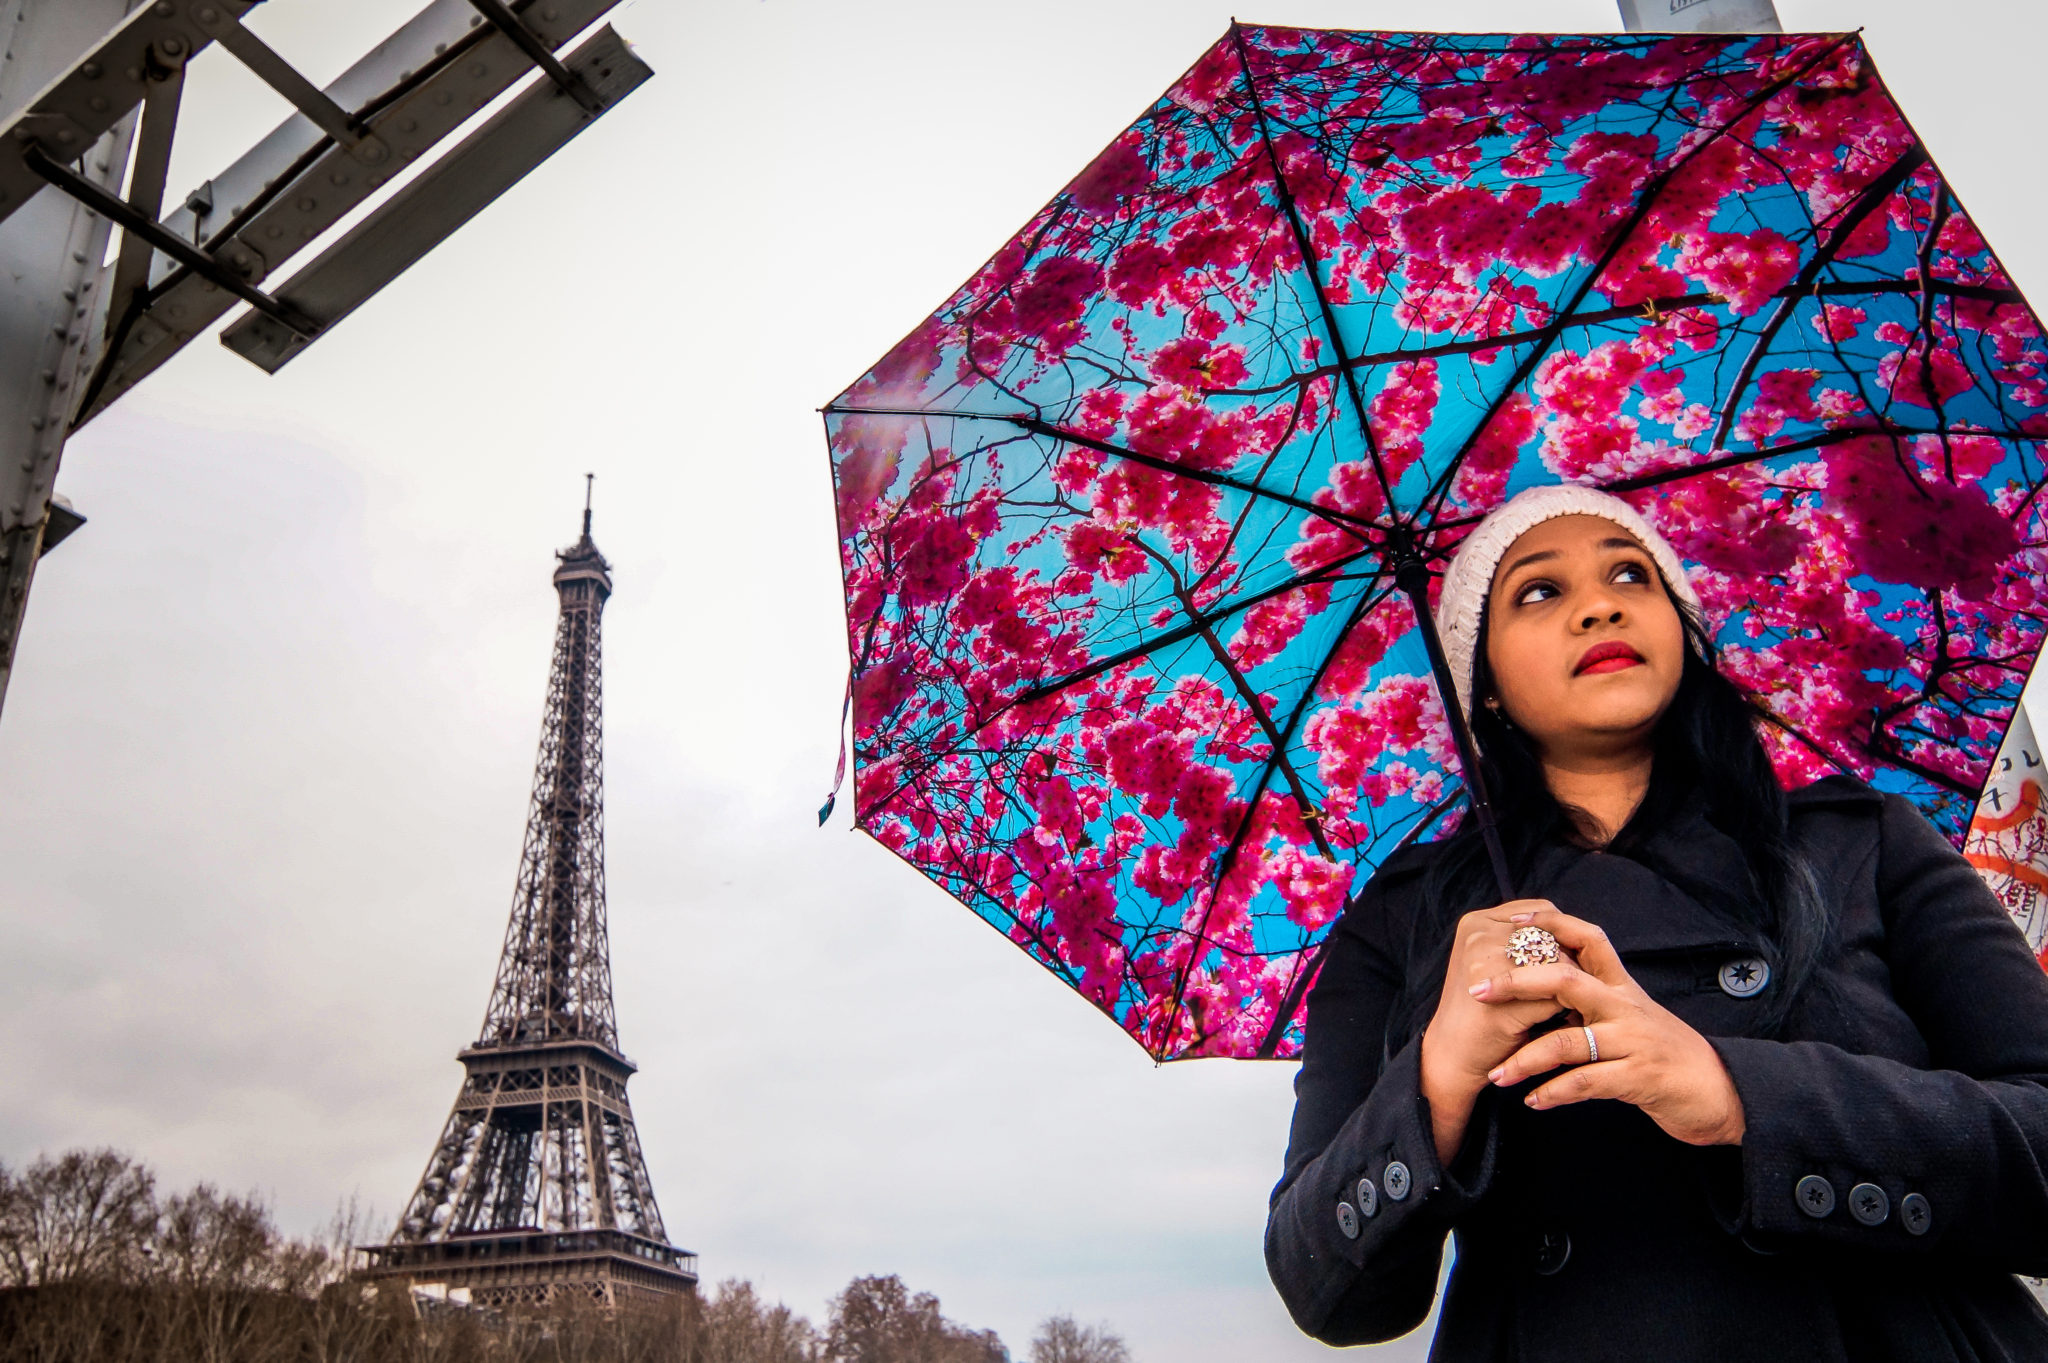 Hemaposesesvalises_Happysweeds_Cherry_Umbrella_Tour_Eiffel_winter_paris_blog_mode